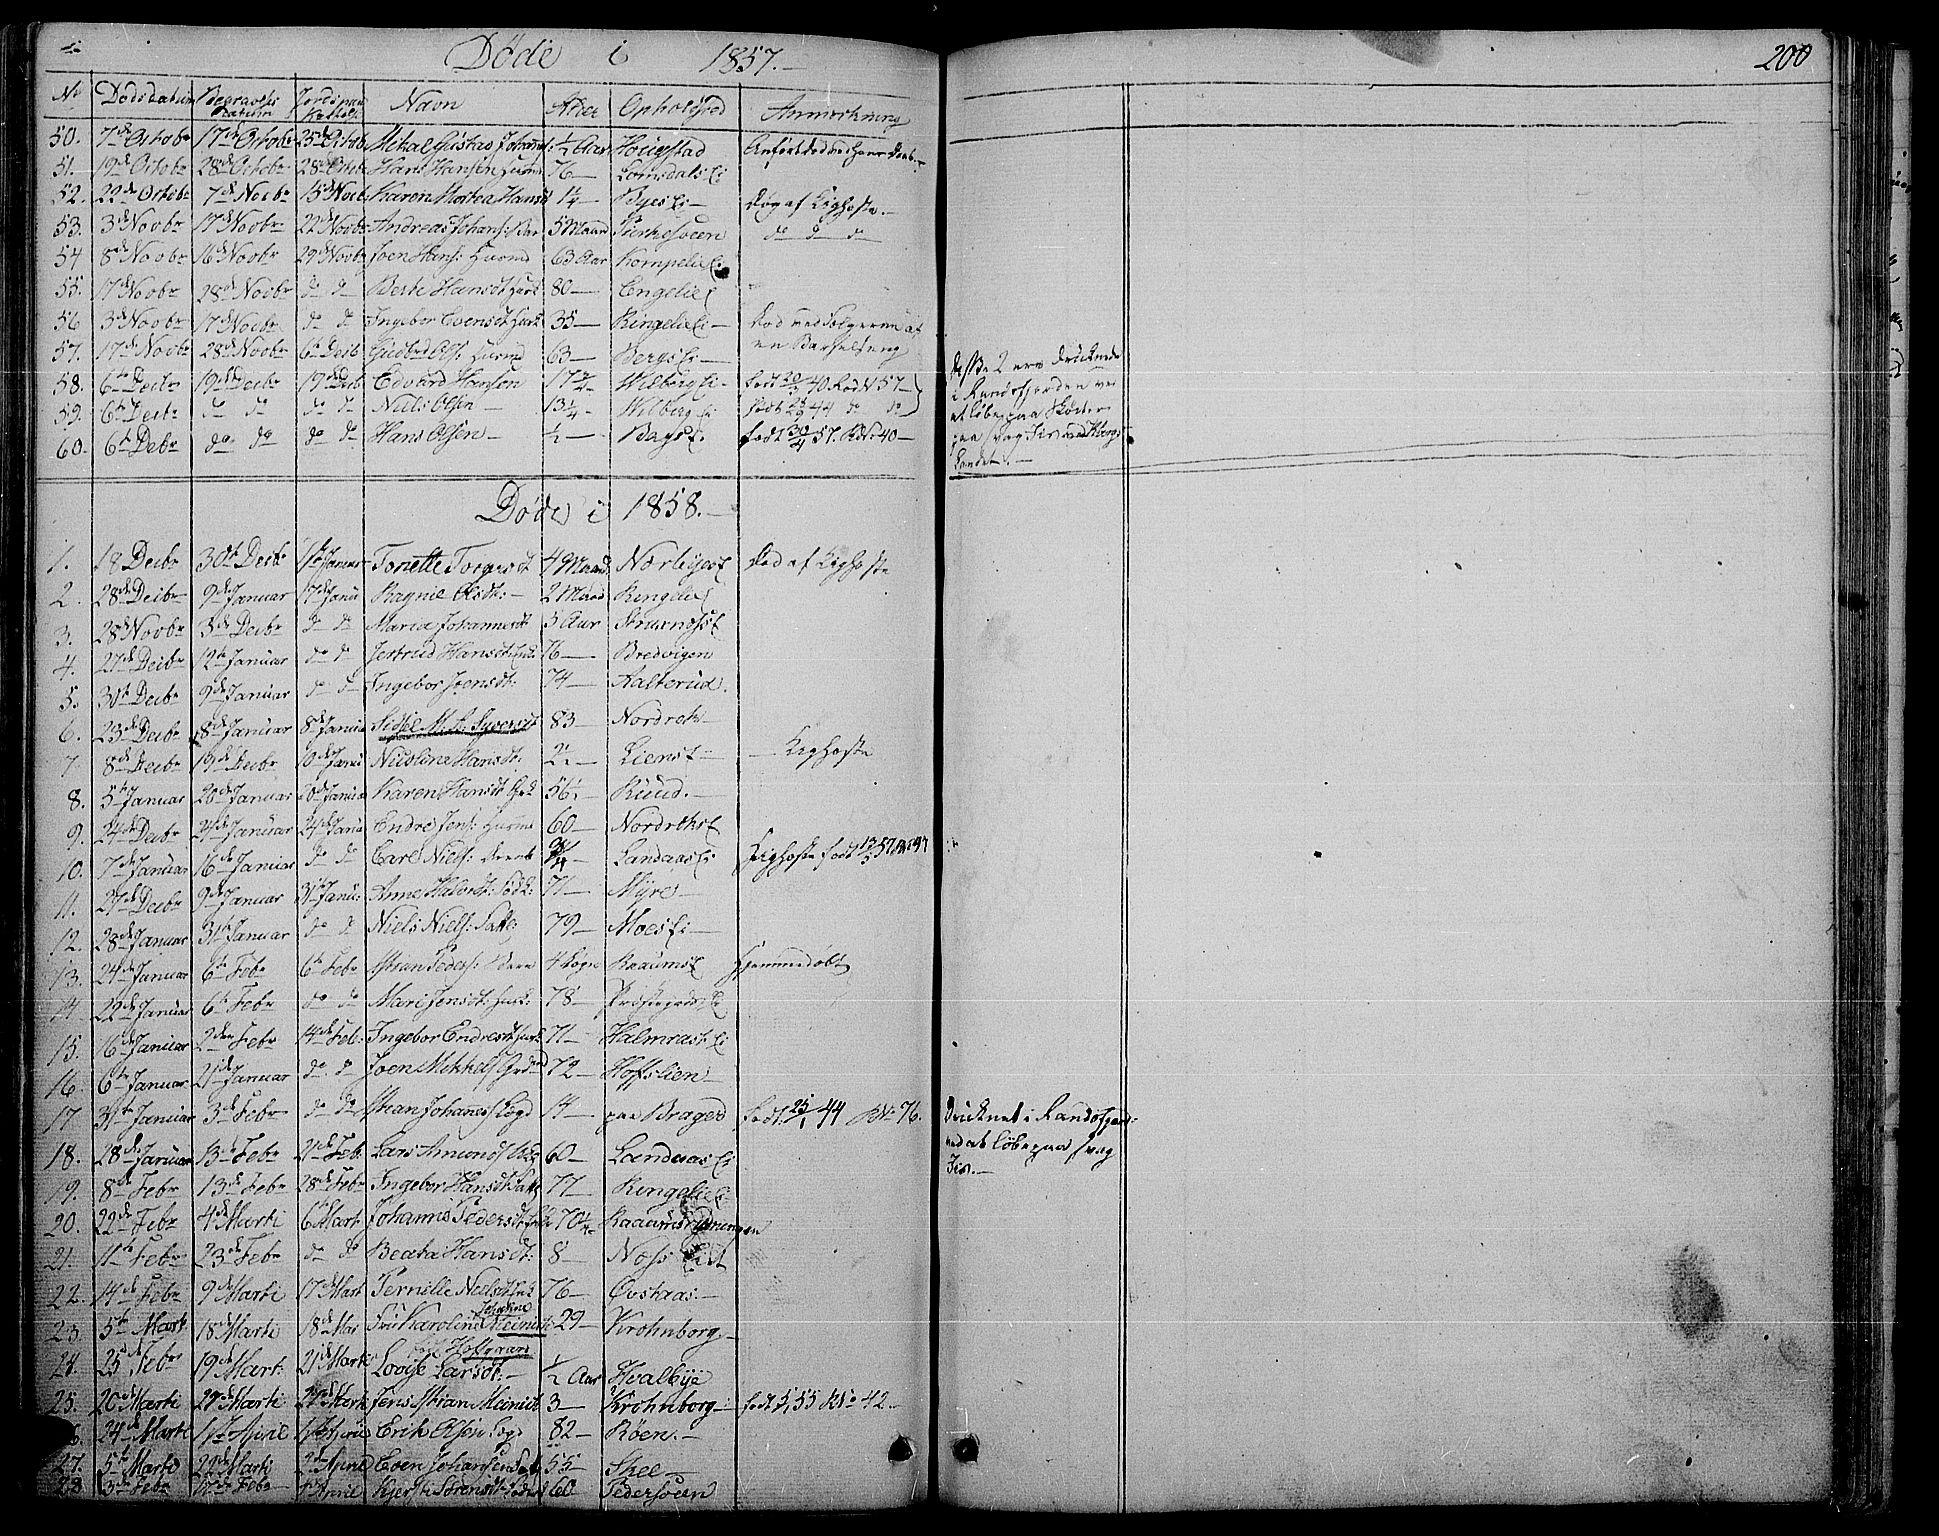 SAH, Søndre Land prestekontor, L/L0001: Klokkerbok nr. 1, 1849-1883, s. 200